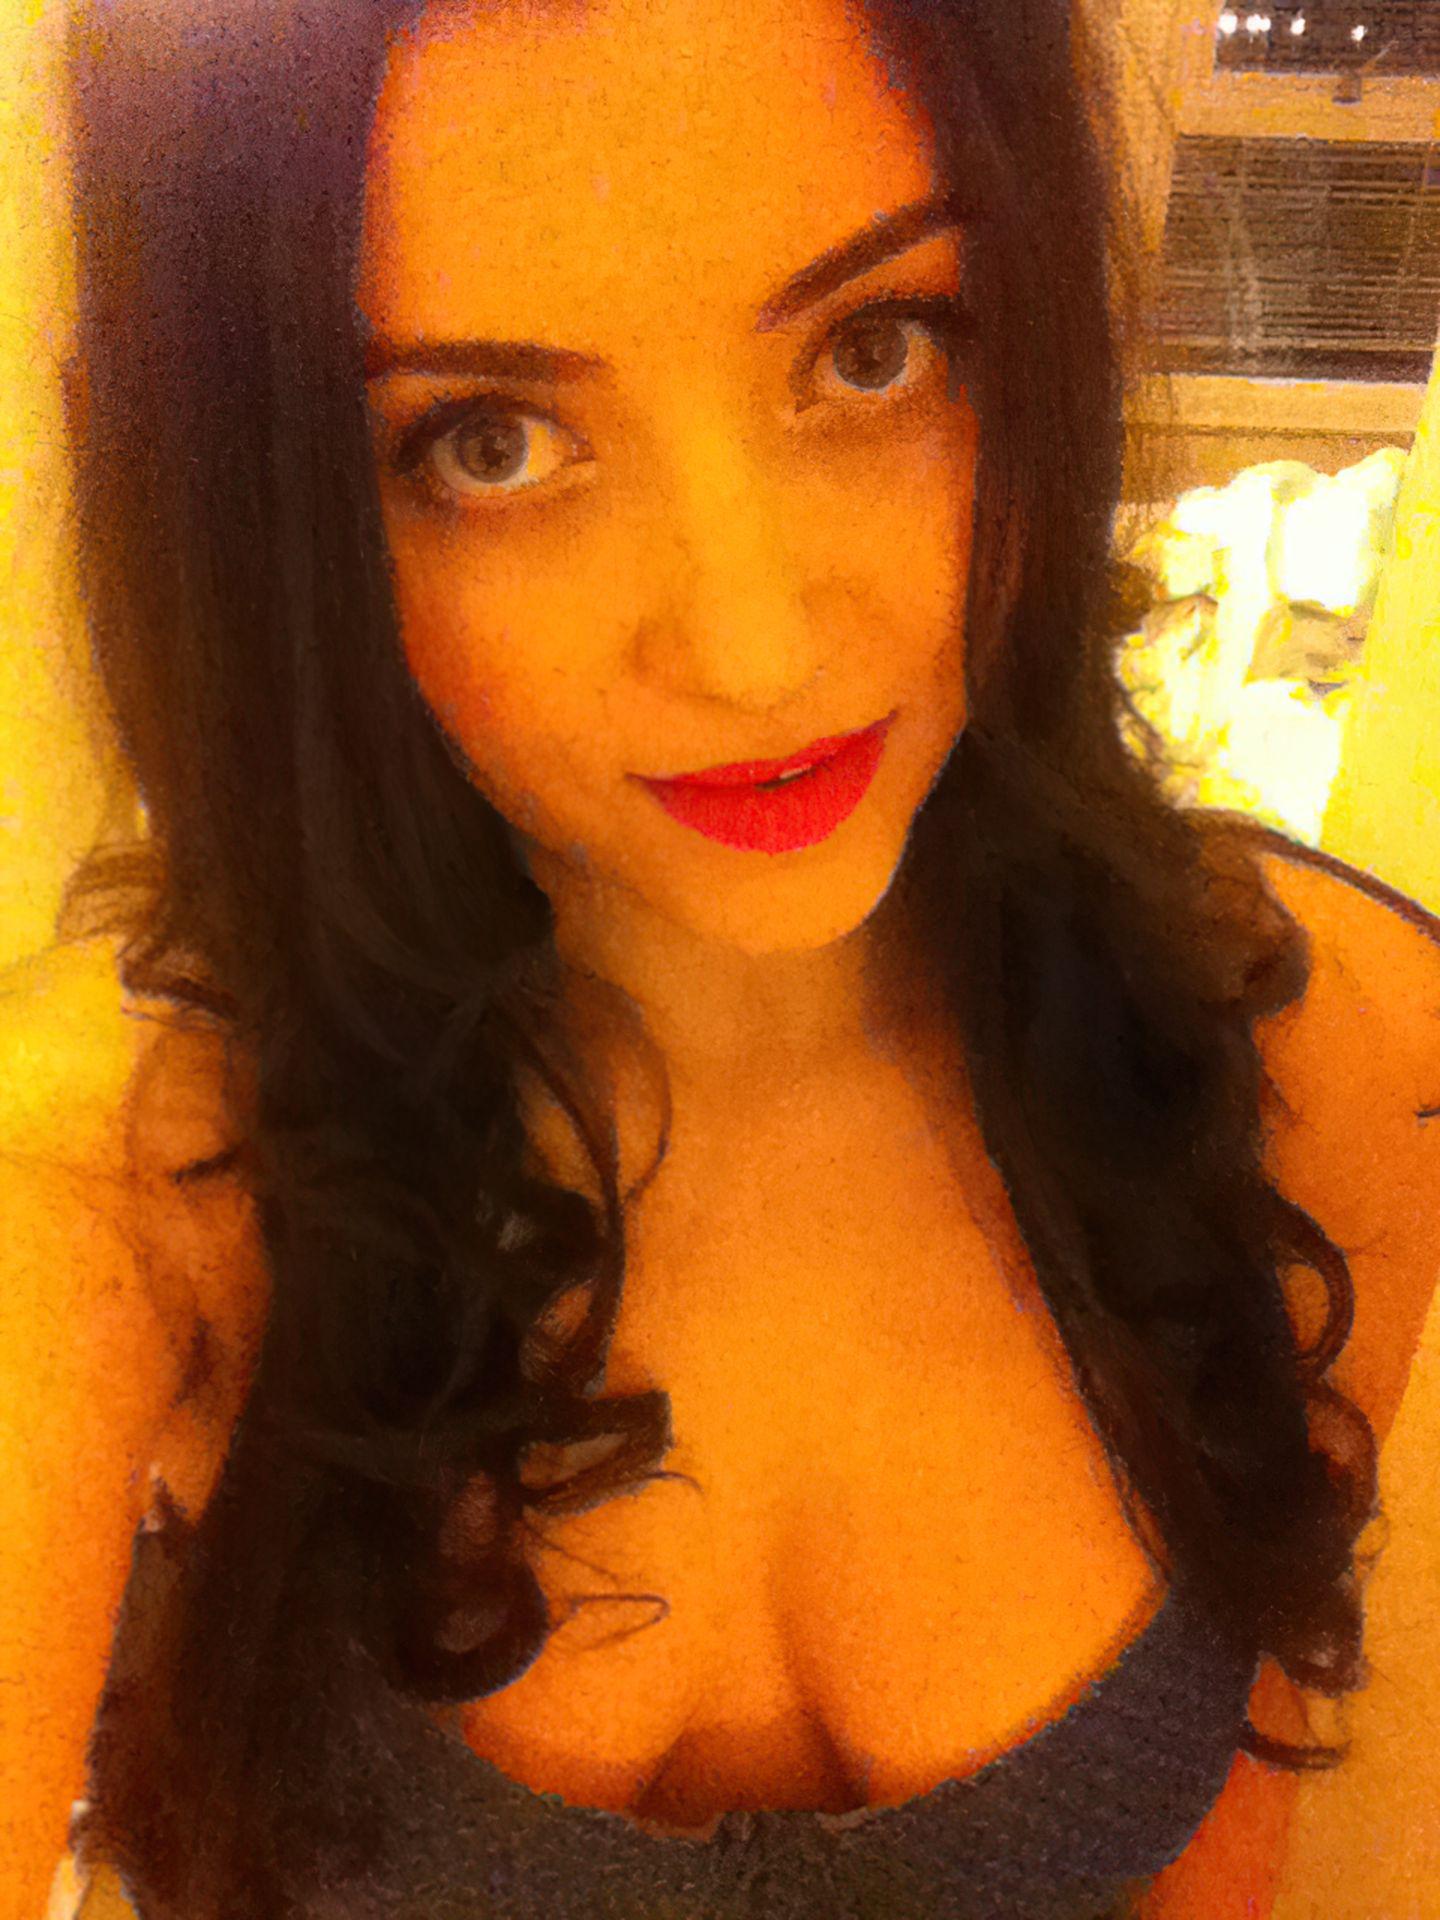 Alia Domino nude photos leaked